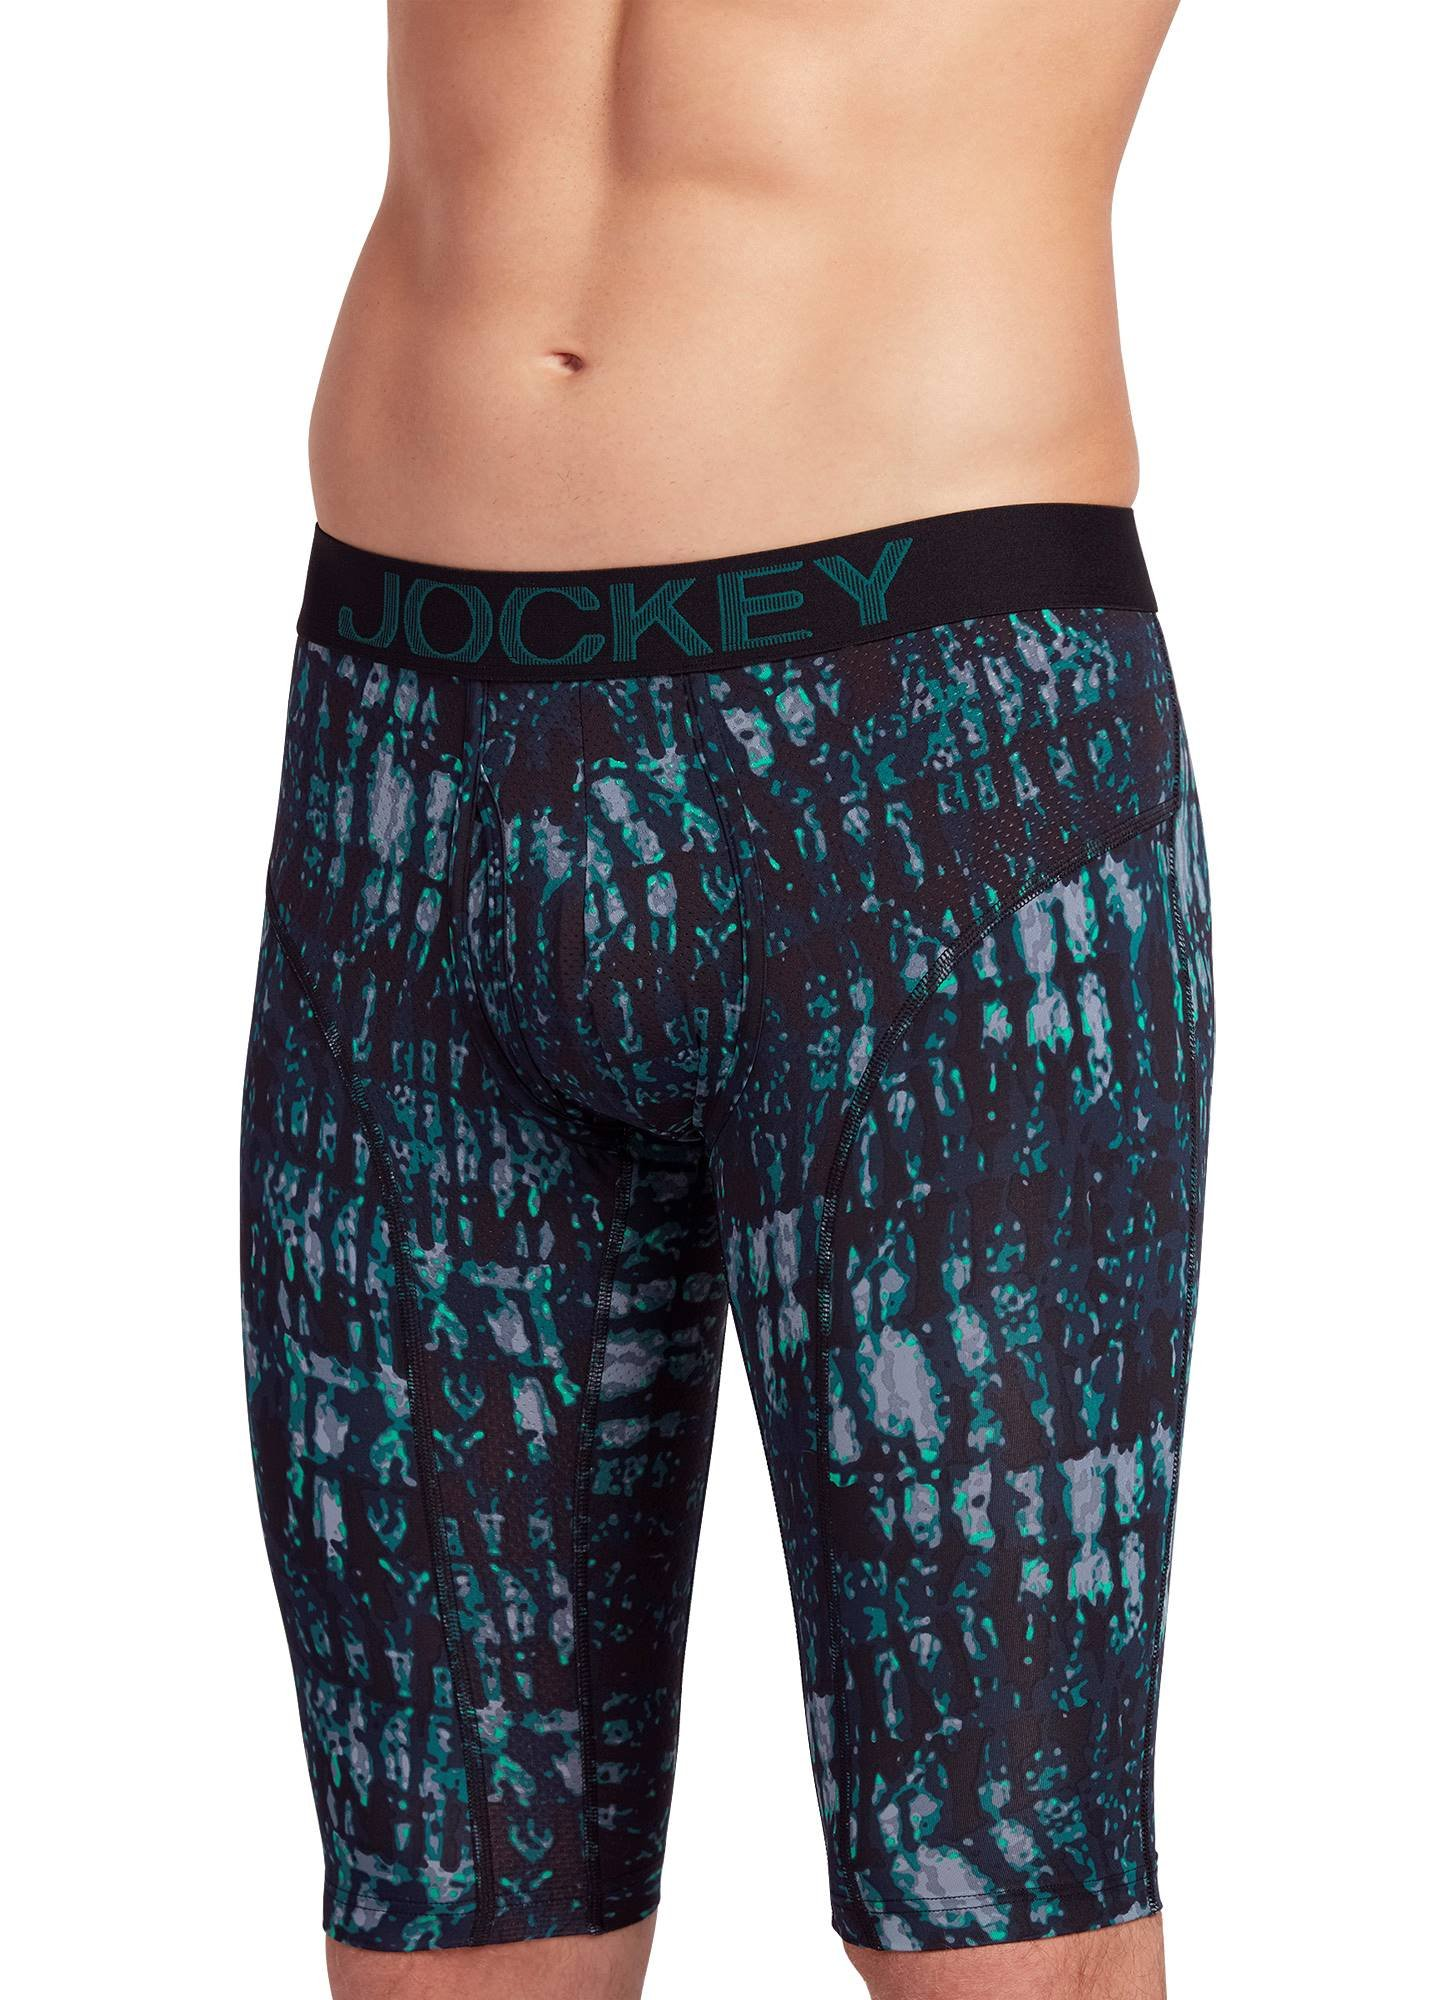 Jockey Men's Underwear RapidCool™ Quad Short - 2 Pack, Emergent Grey and Green/True Navy, 2XL